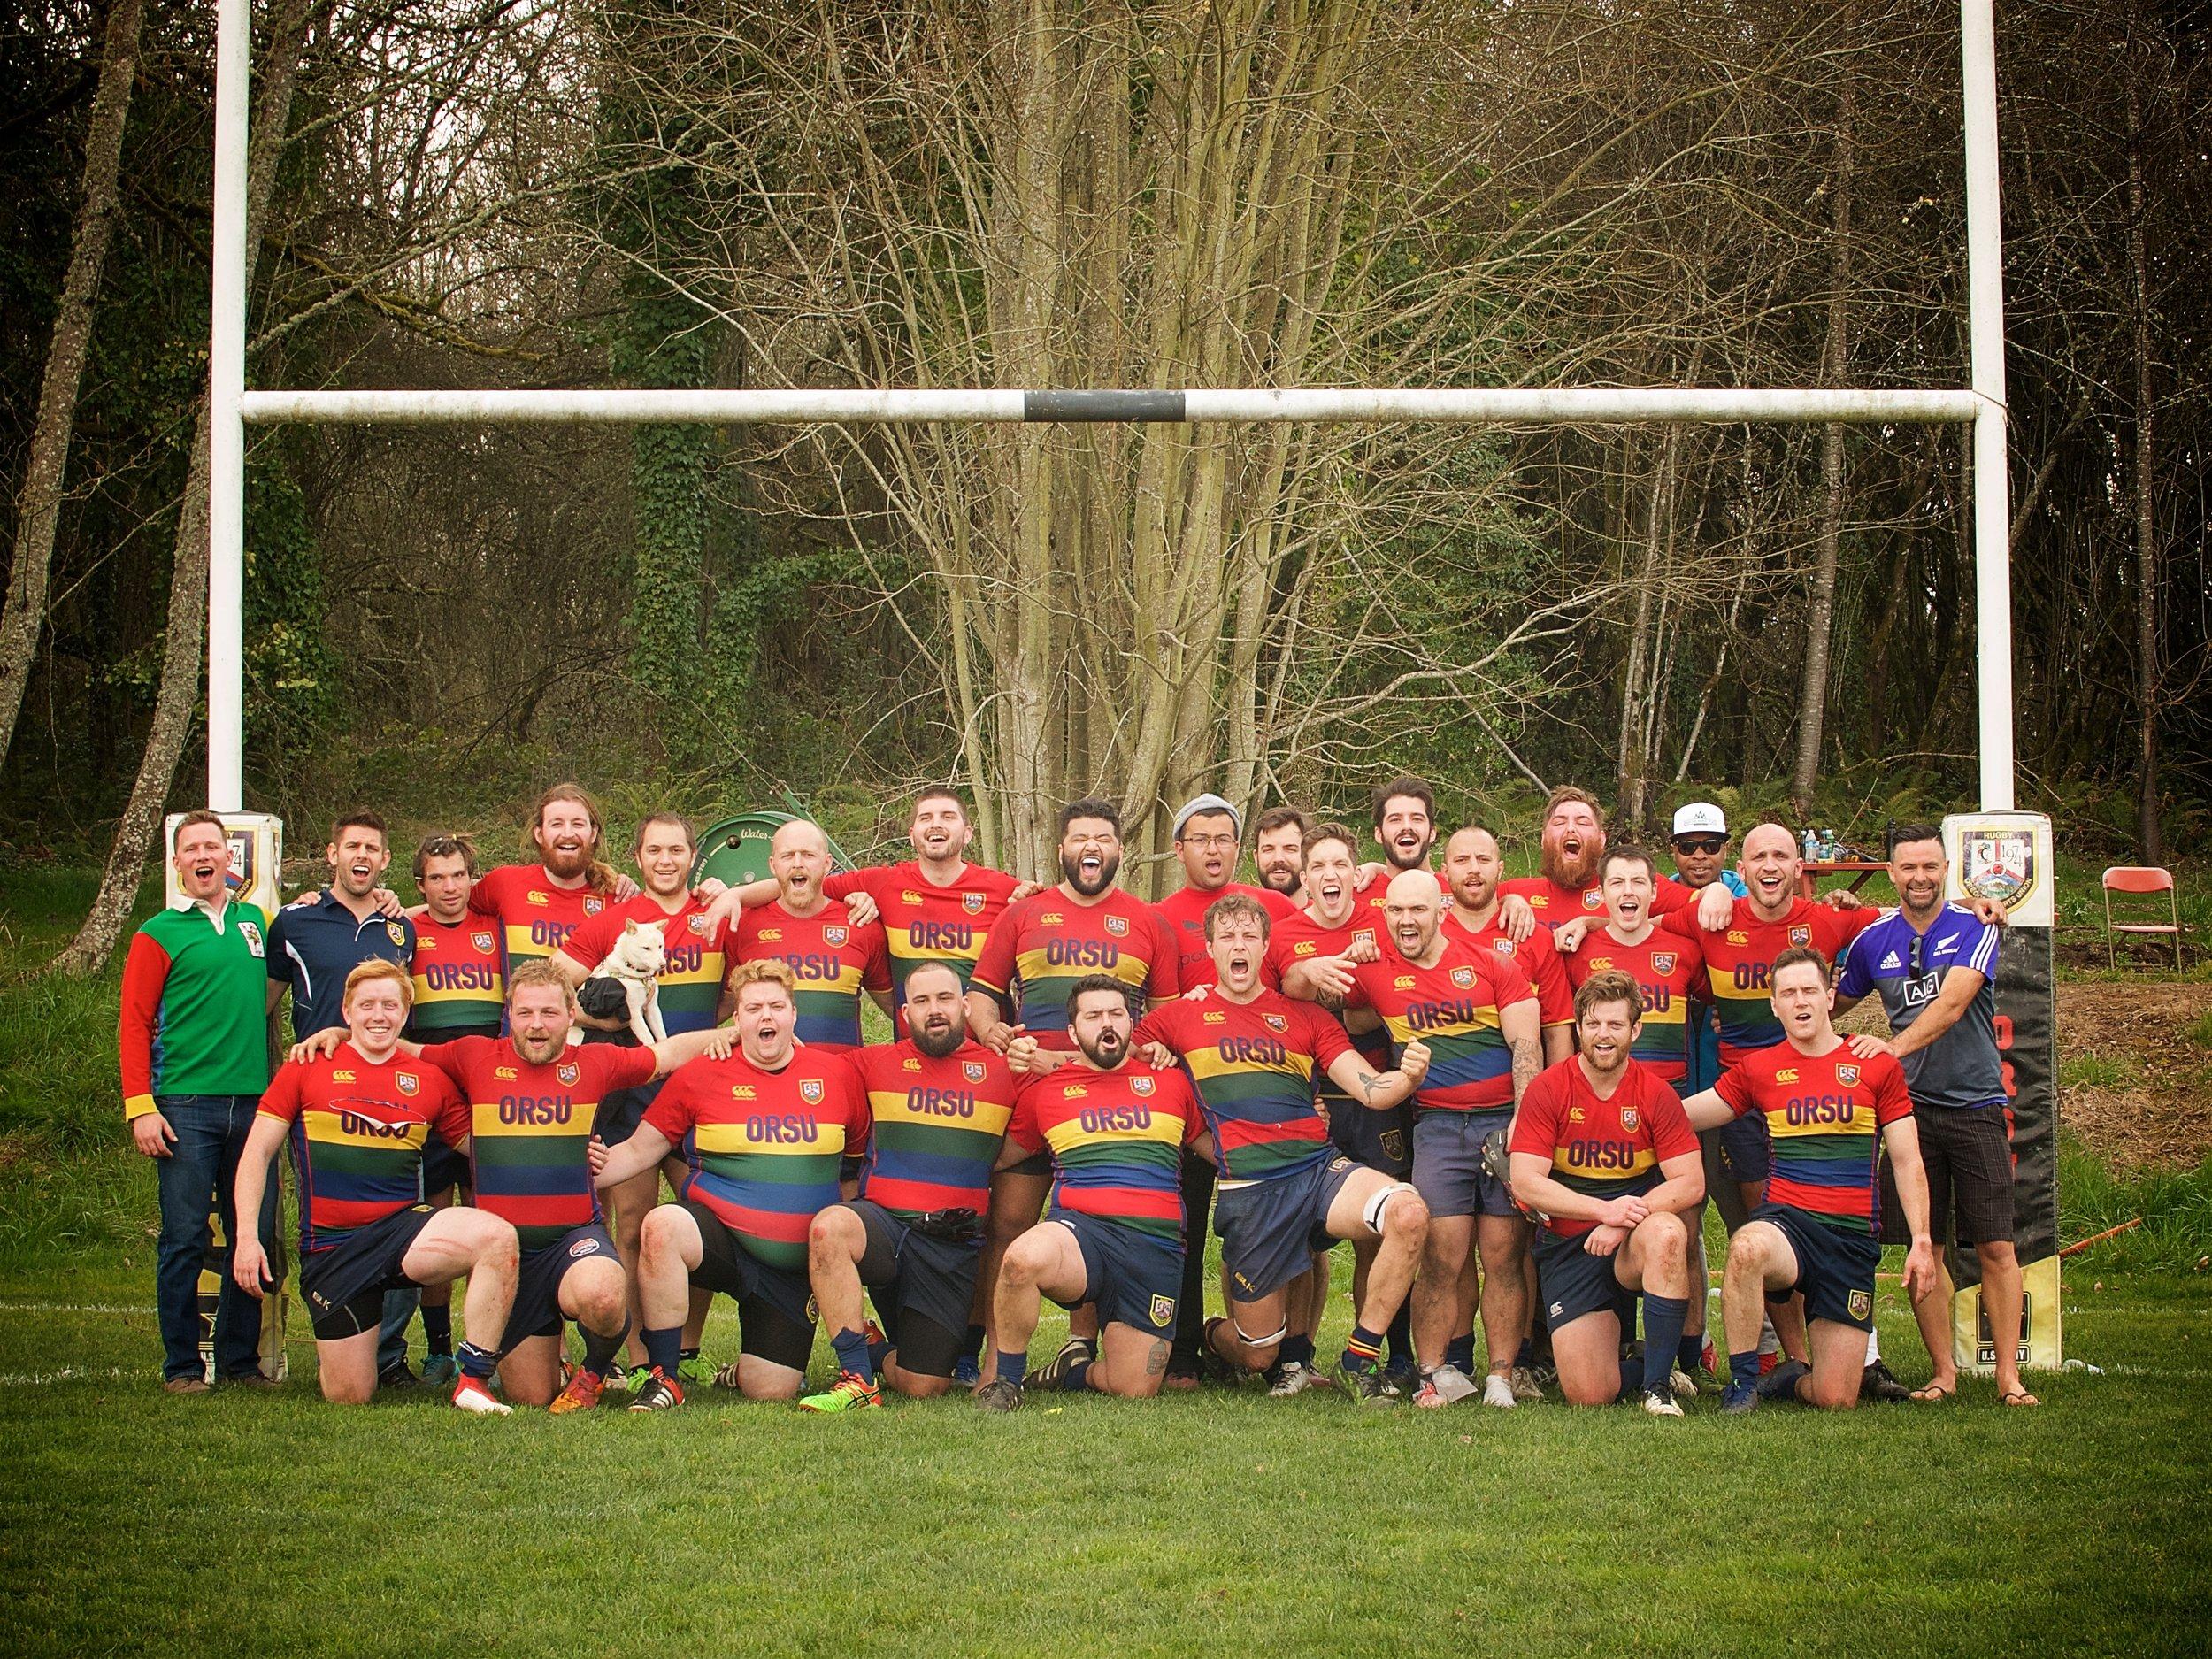 ORSU-Mens-Division3-Rugby.jpg